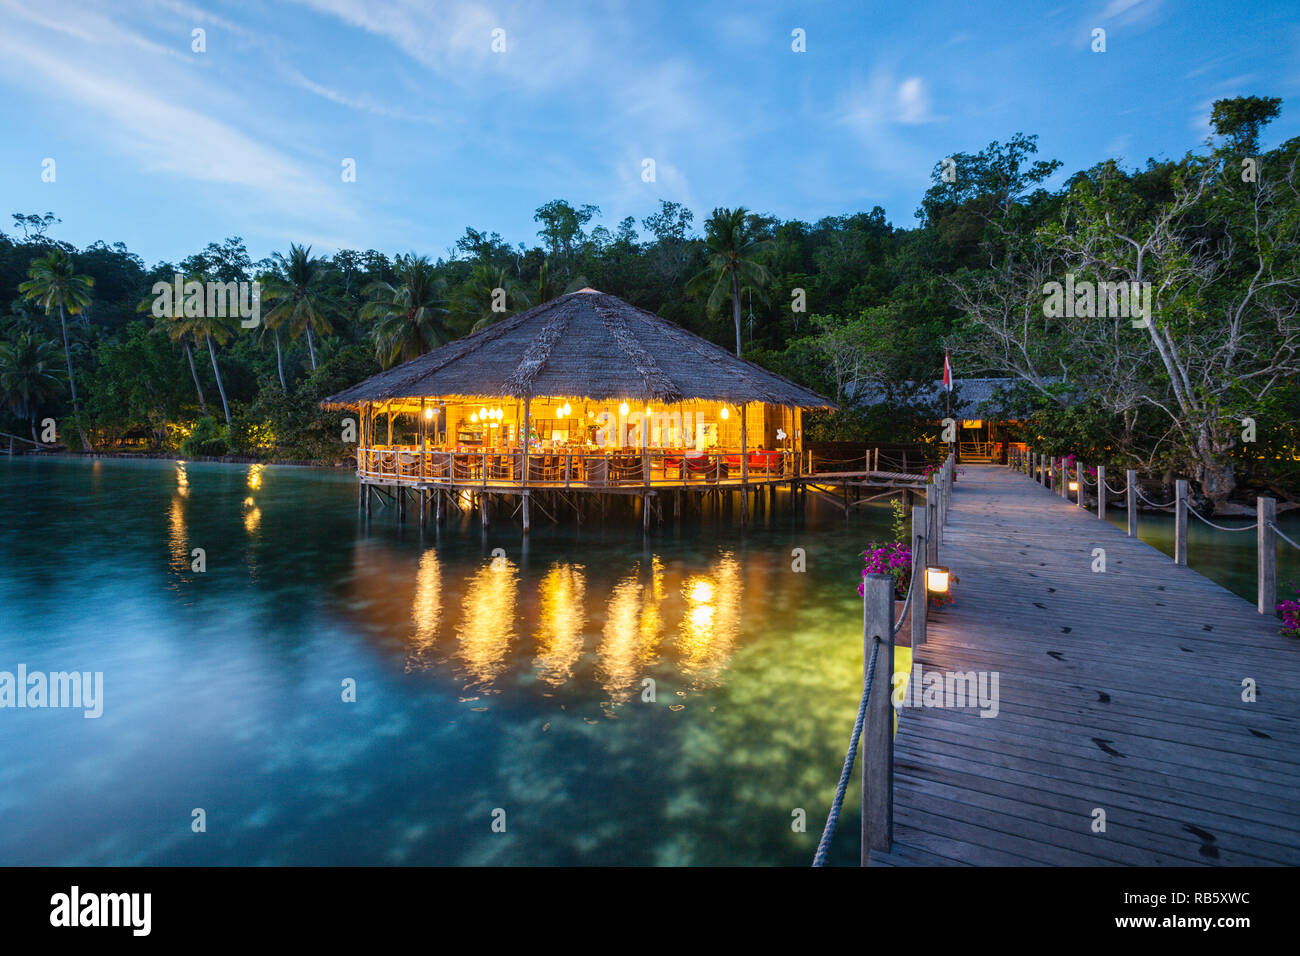 Papua Resort Divers, Raja Ampat Explorer, Indonesia Imagen De Stock